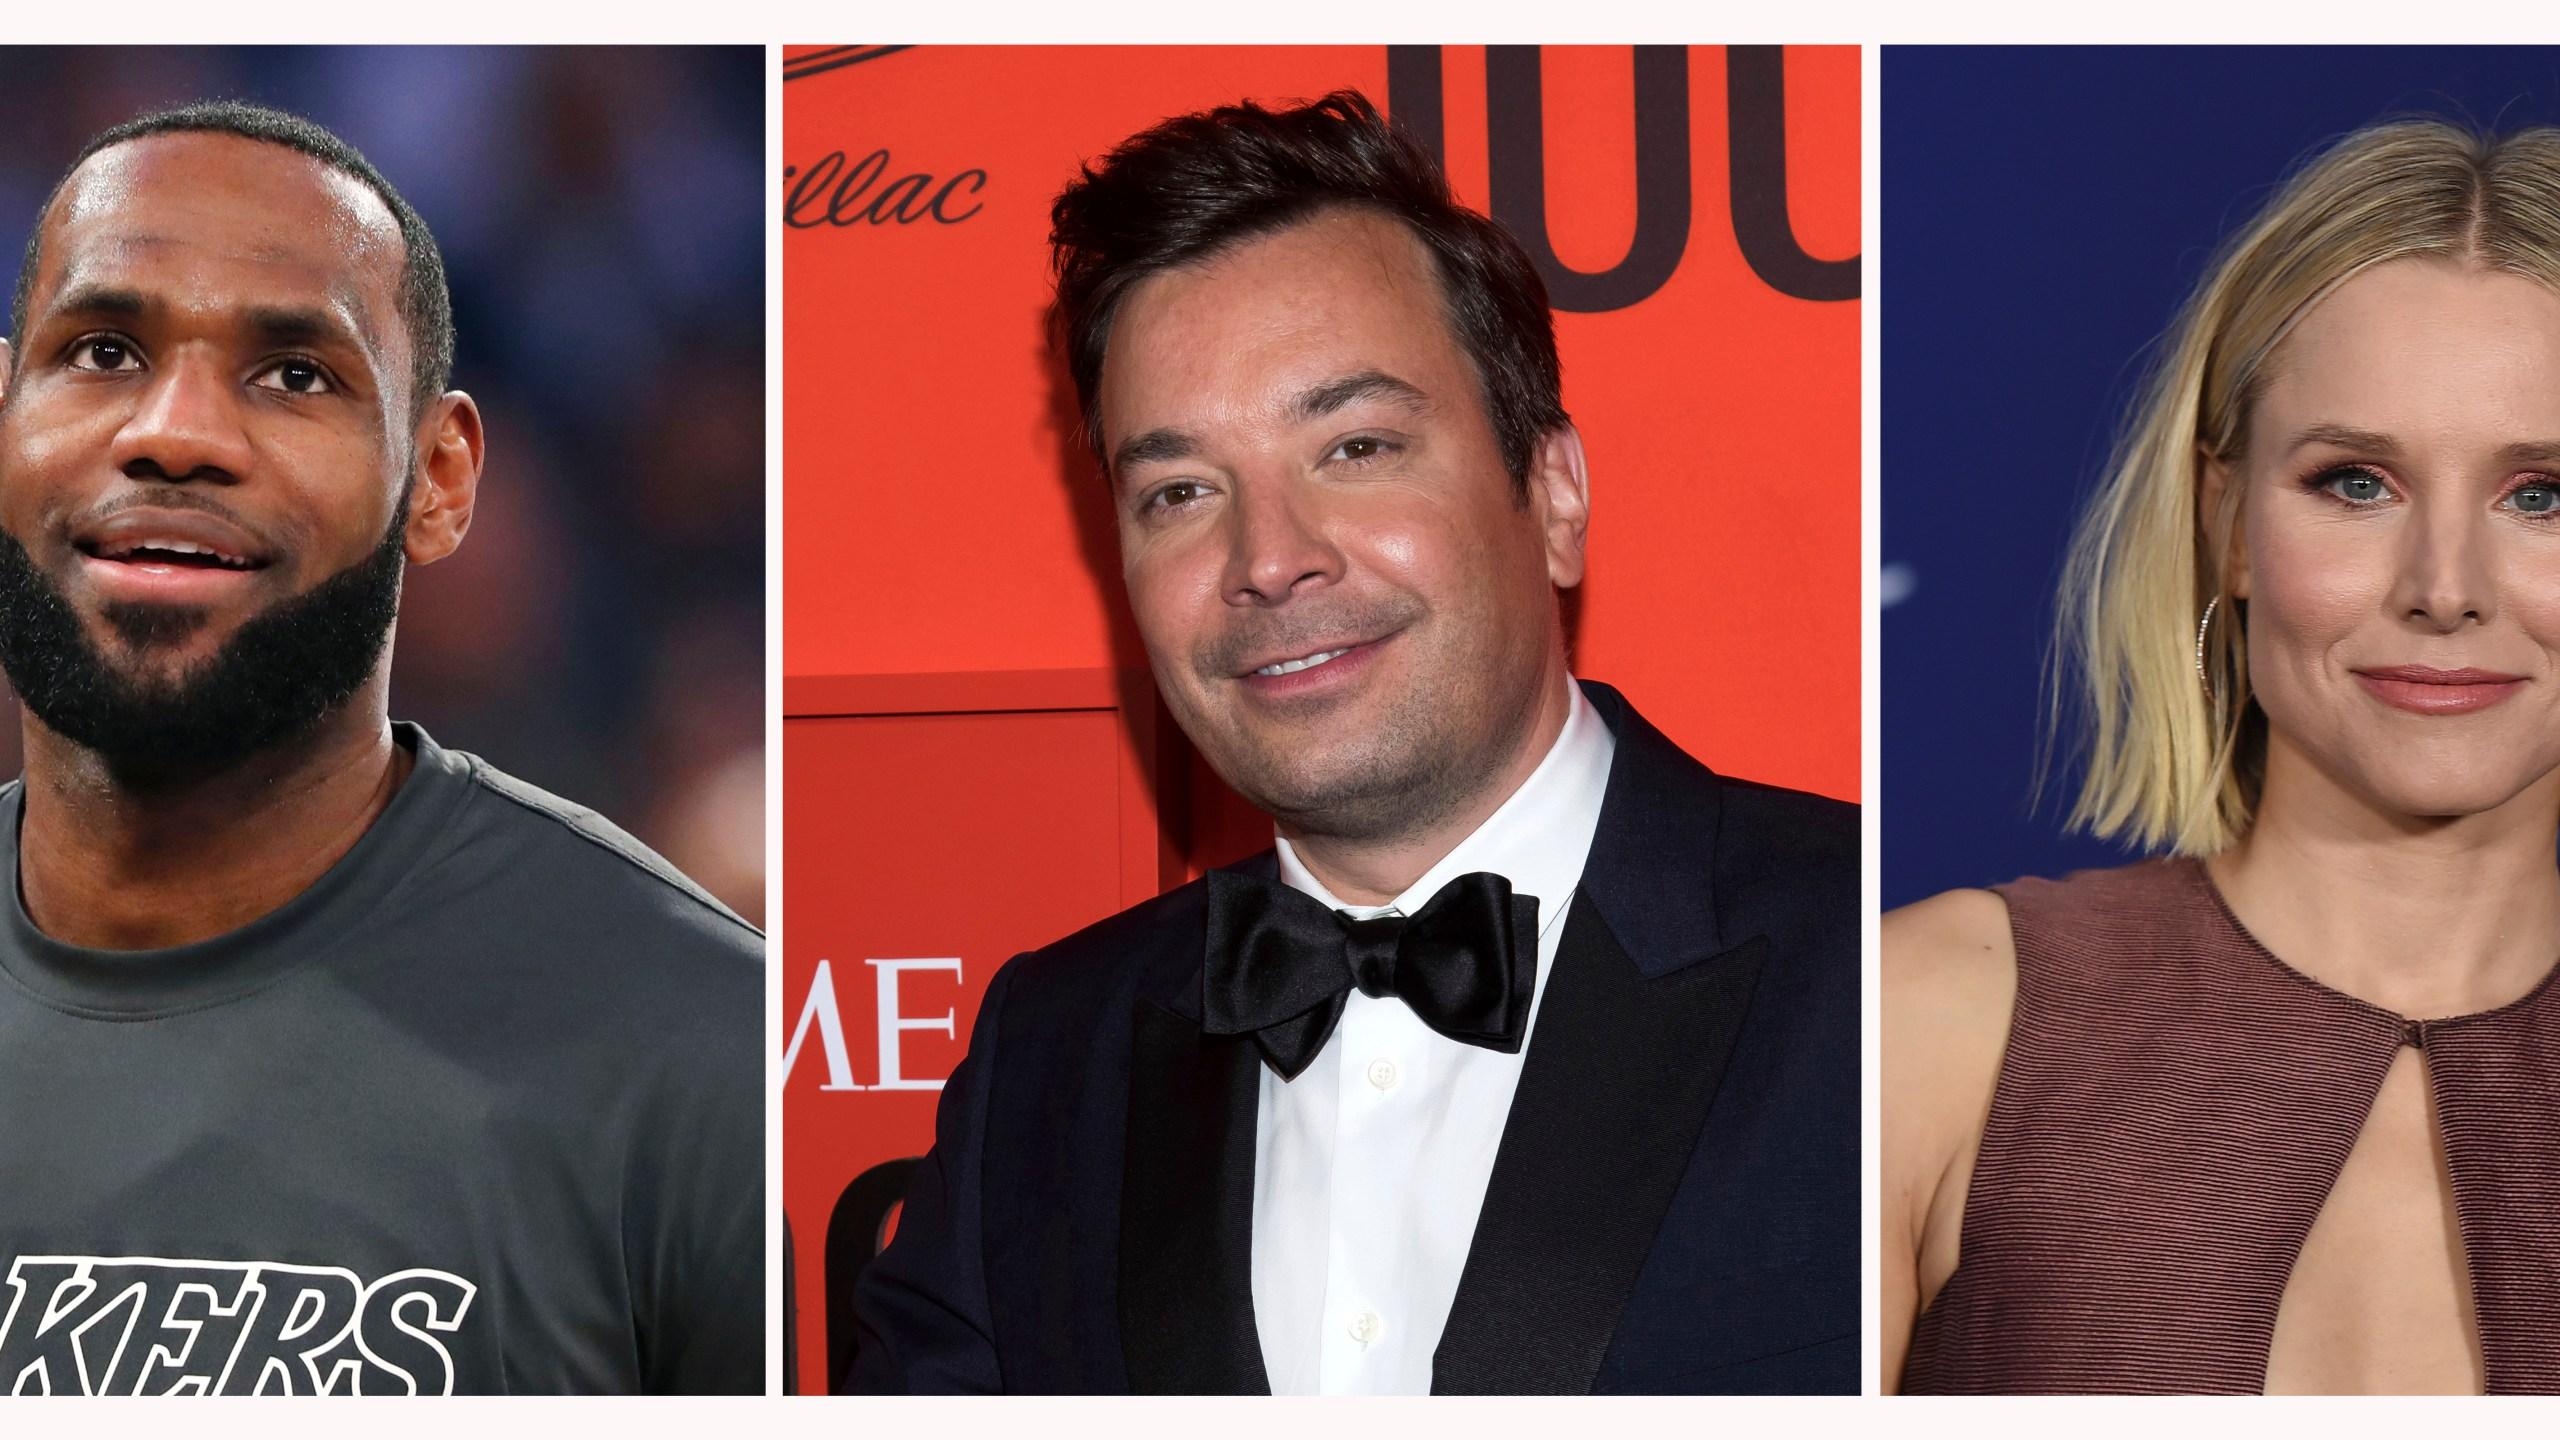 LeBron James, Jimmy Fallon, Kristen Bell